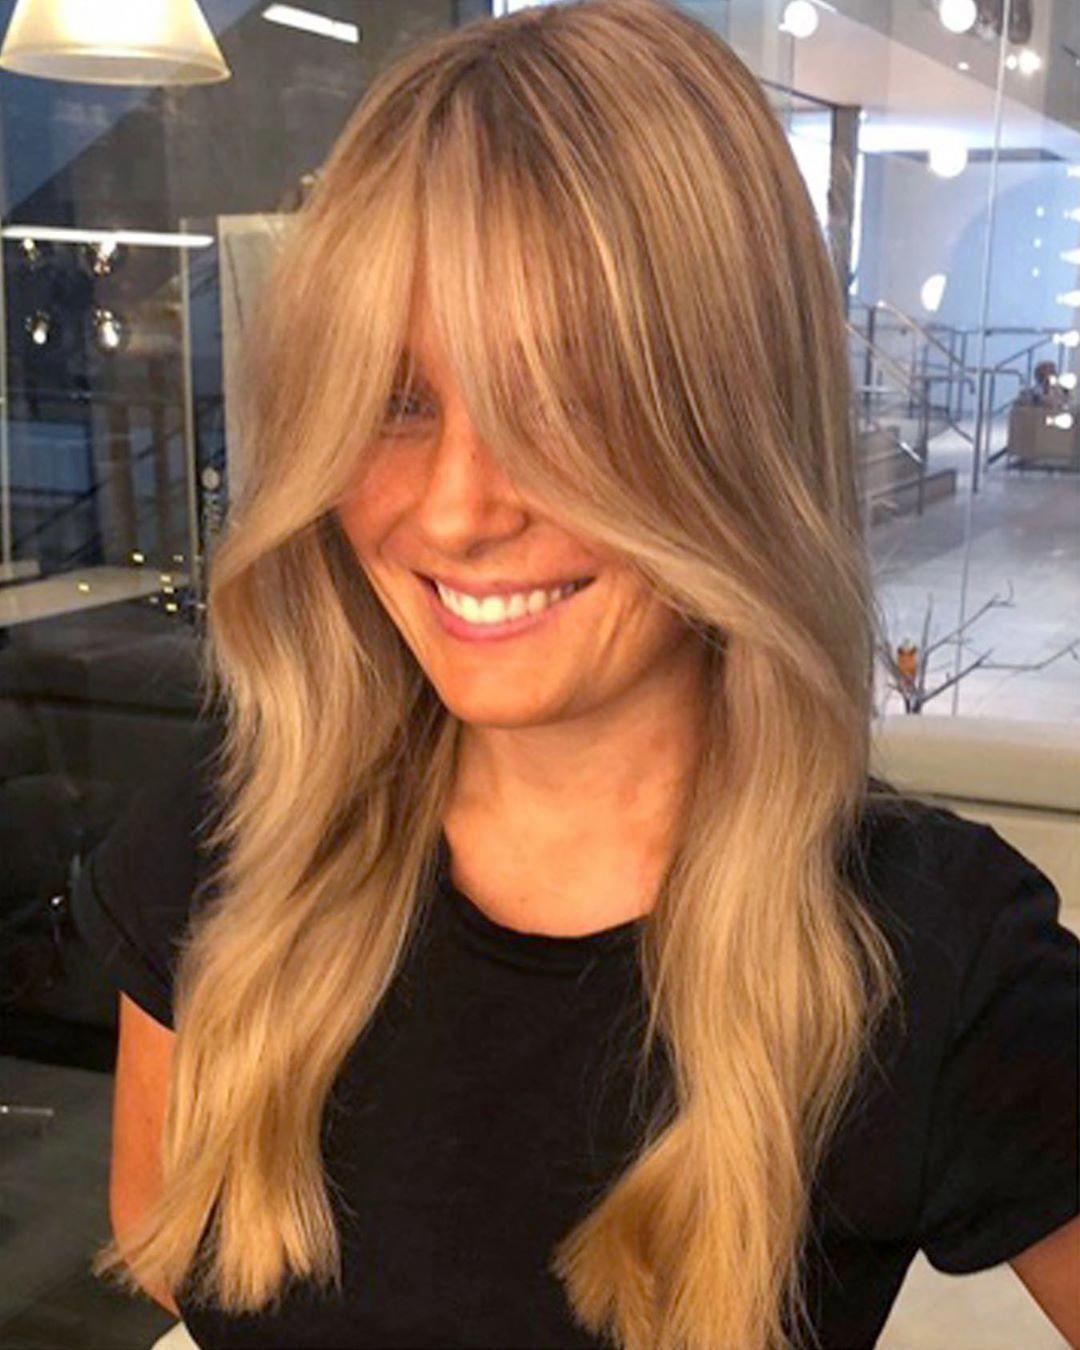 Perth Hair Salon On Instagram Curtain Fringe Realness Loving This Look By Sarahgabriella Mauricemeade For In 2020 Fringe Haircut Long Hair Styles Thin Hair Bangs